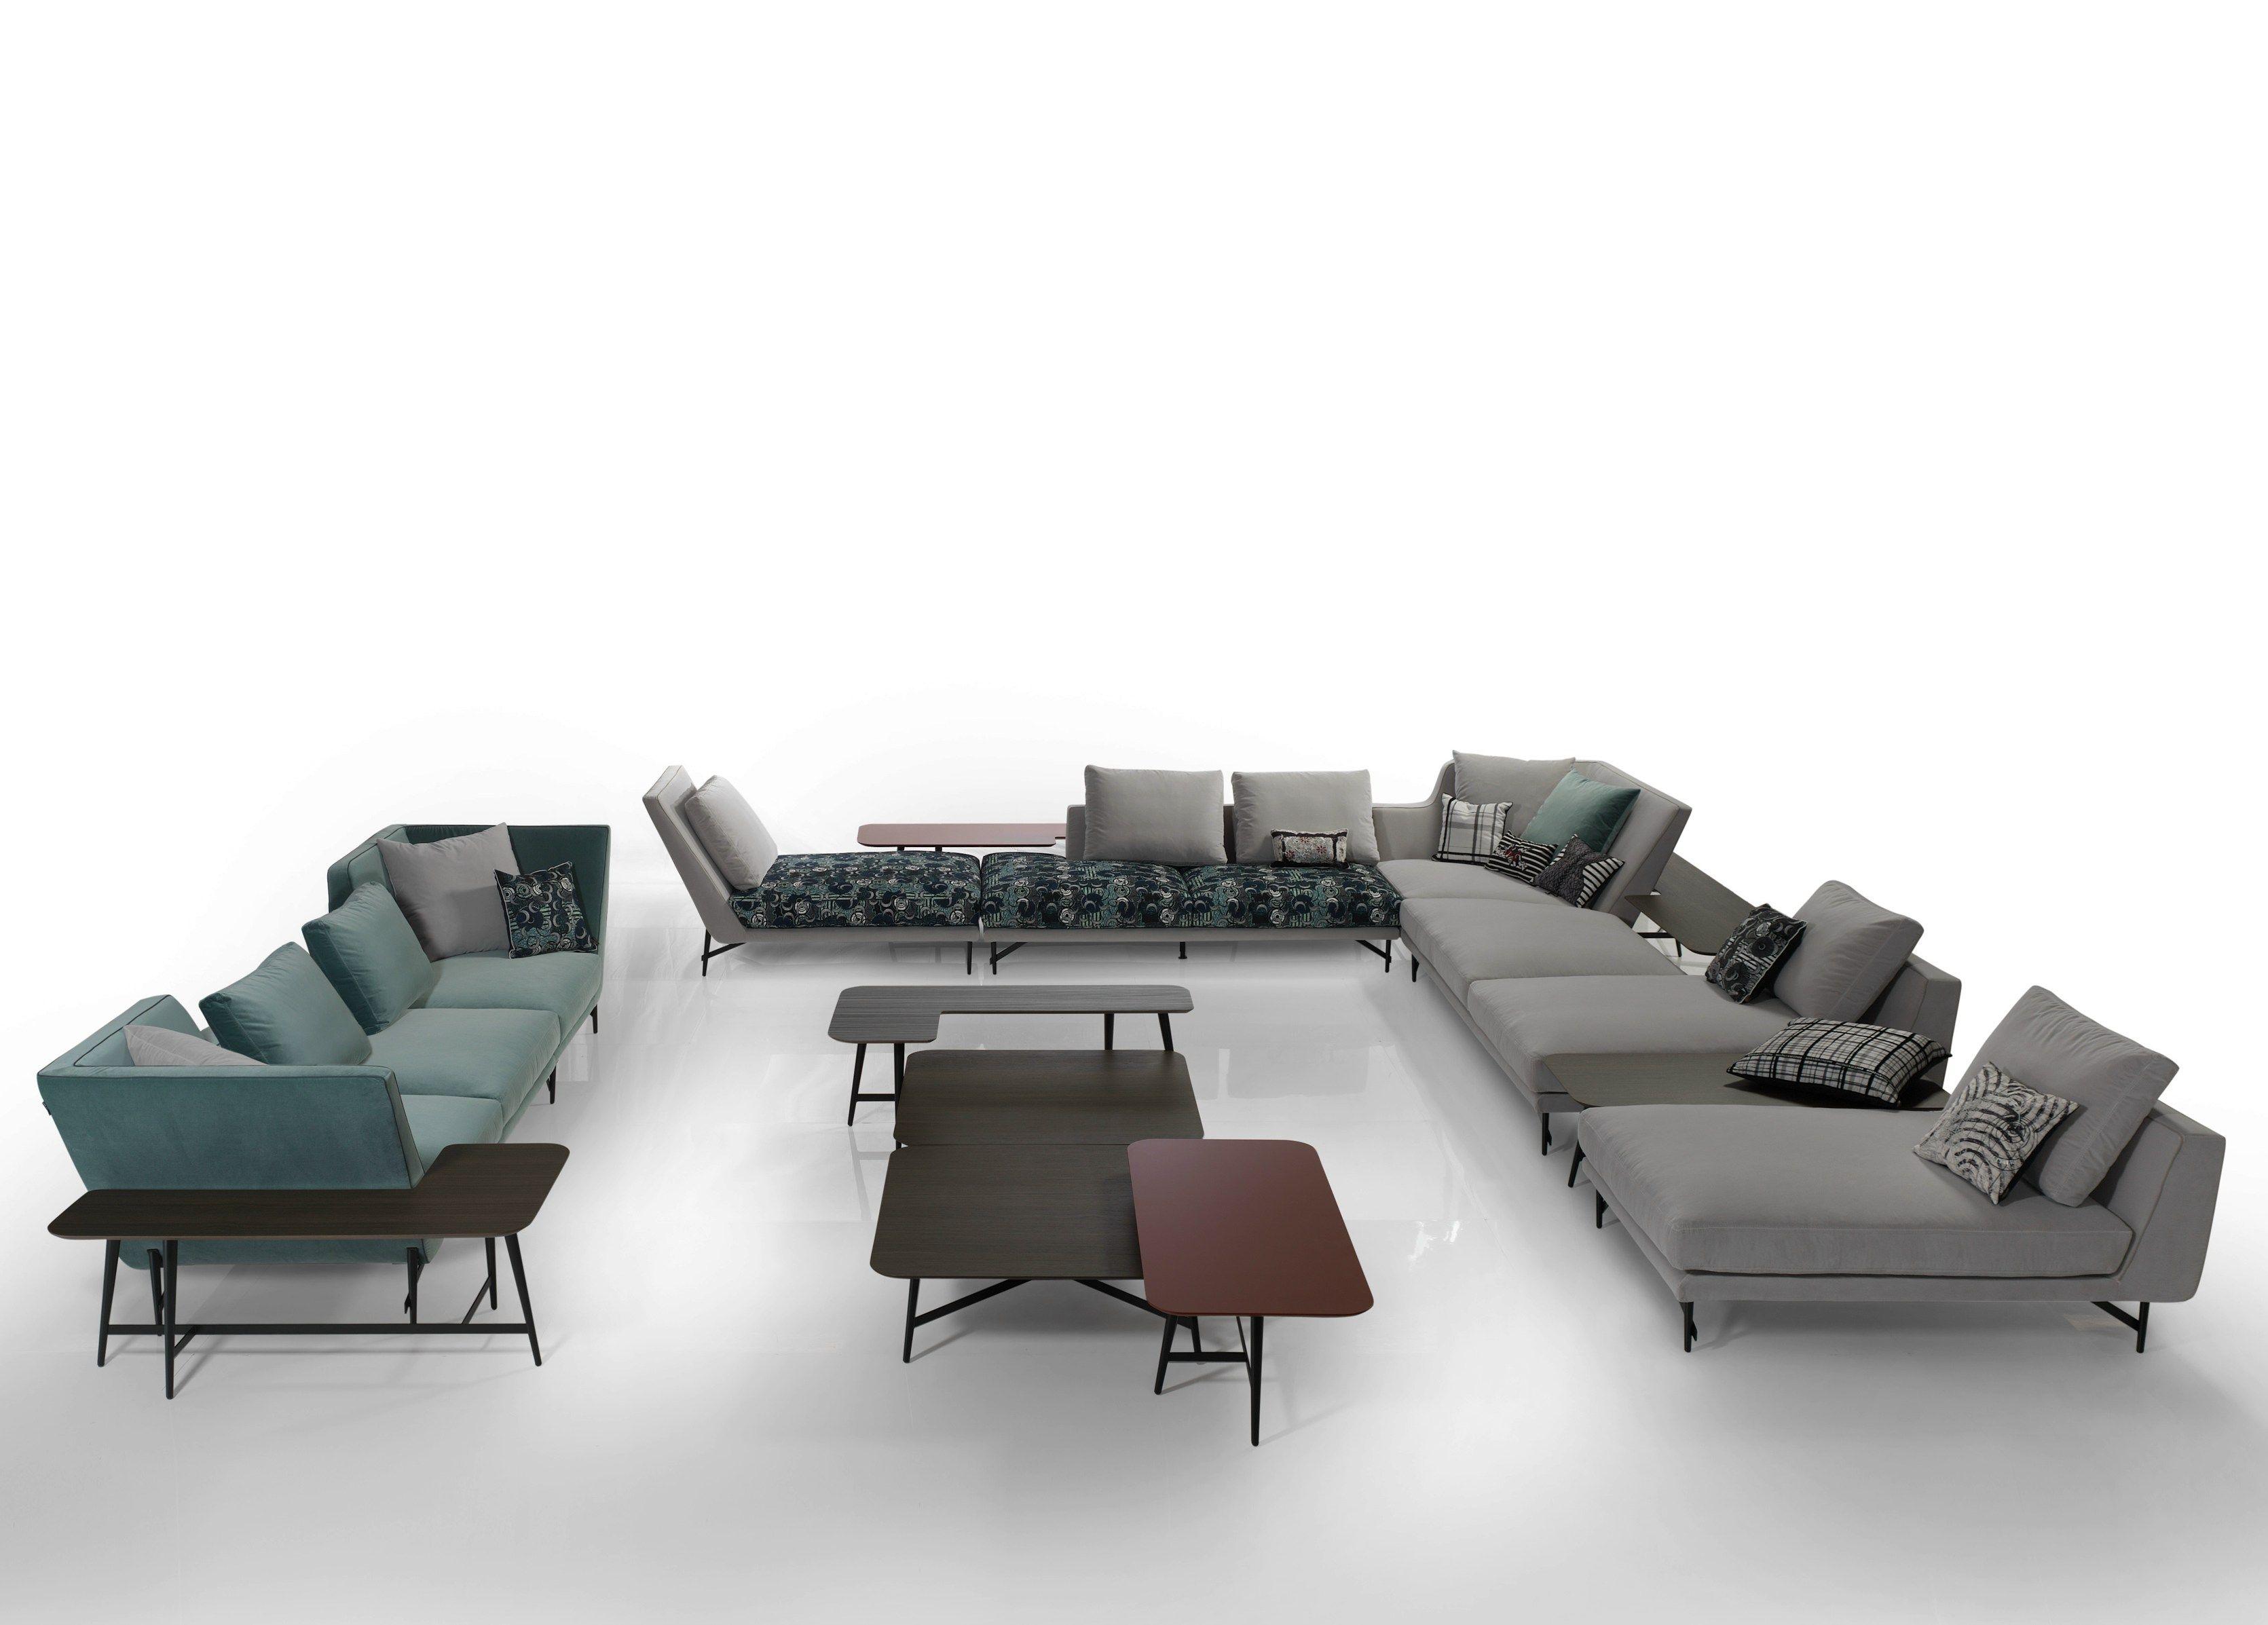 Modular Fabric Sofa Atmos By Roche Bobois Design Maurizio